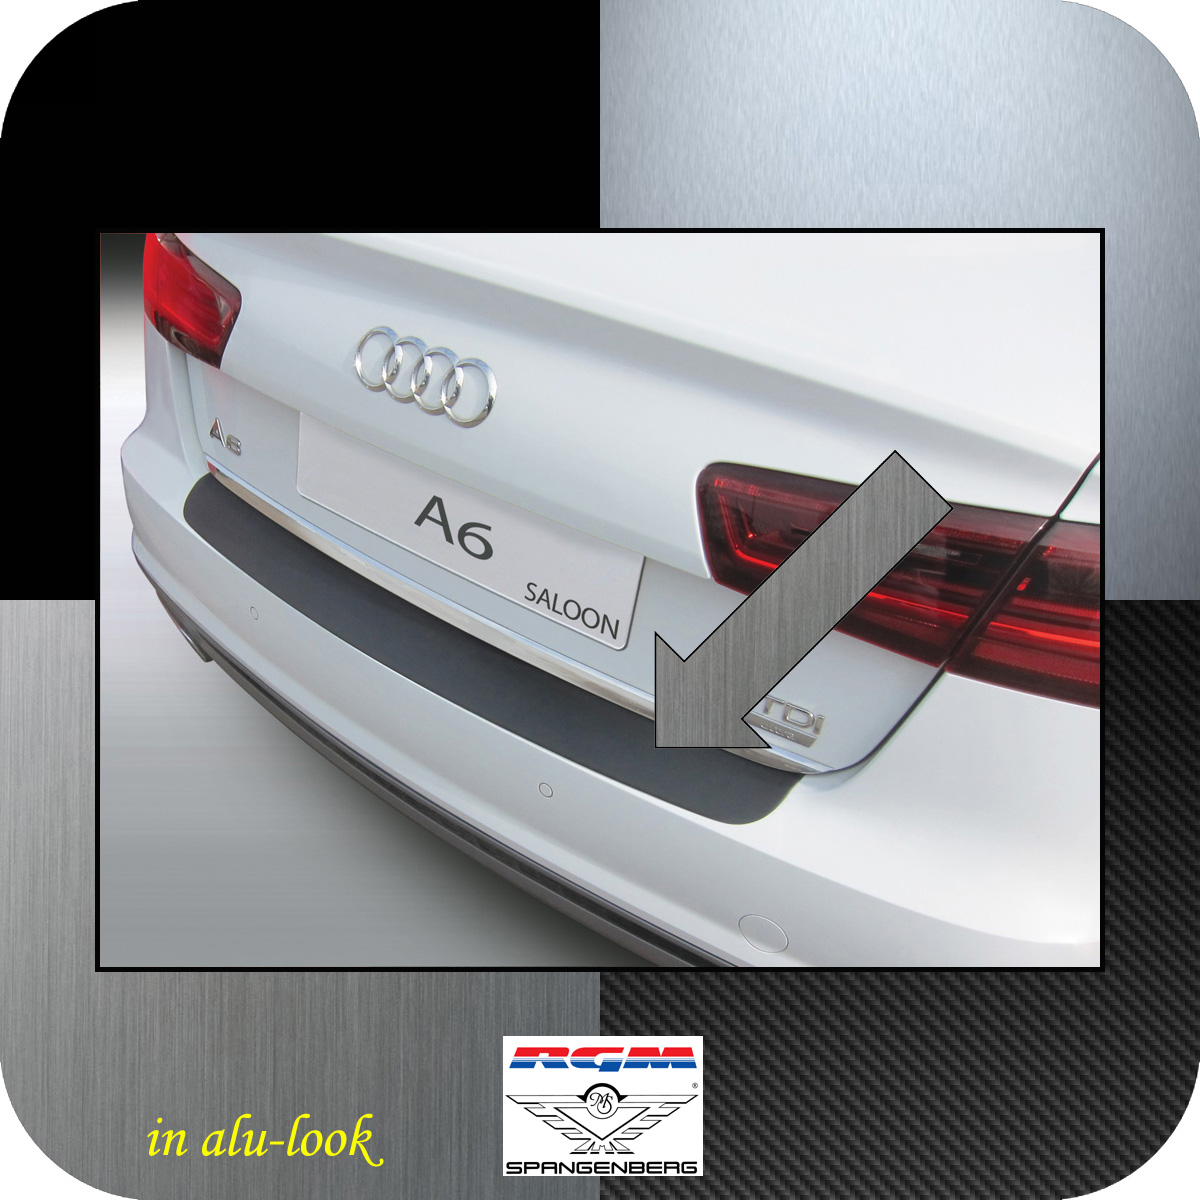 Ladekantenschutz Alu-Look Audi A6 Limousine C7 Baujahre 01.2011-05.2016 3504989